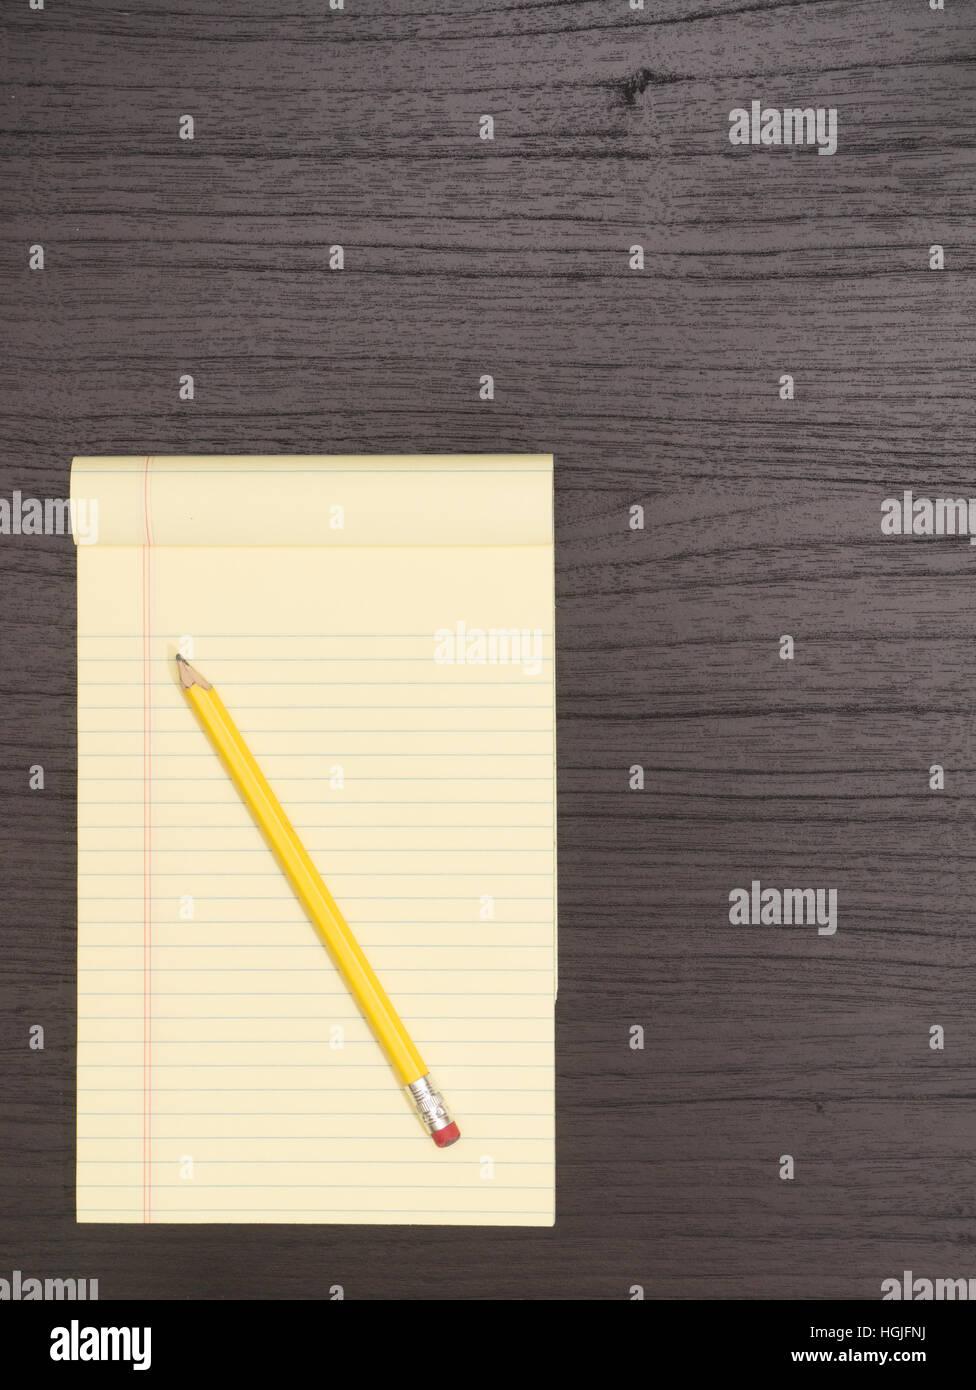 Wood Desk, Yellow Notepad, Pencil - Stock Image